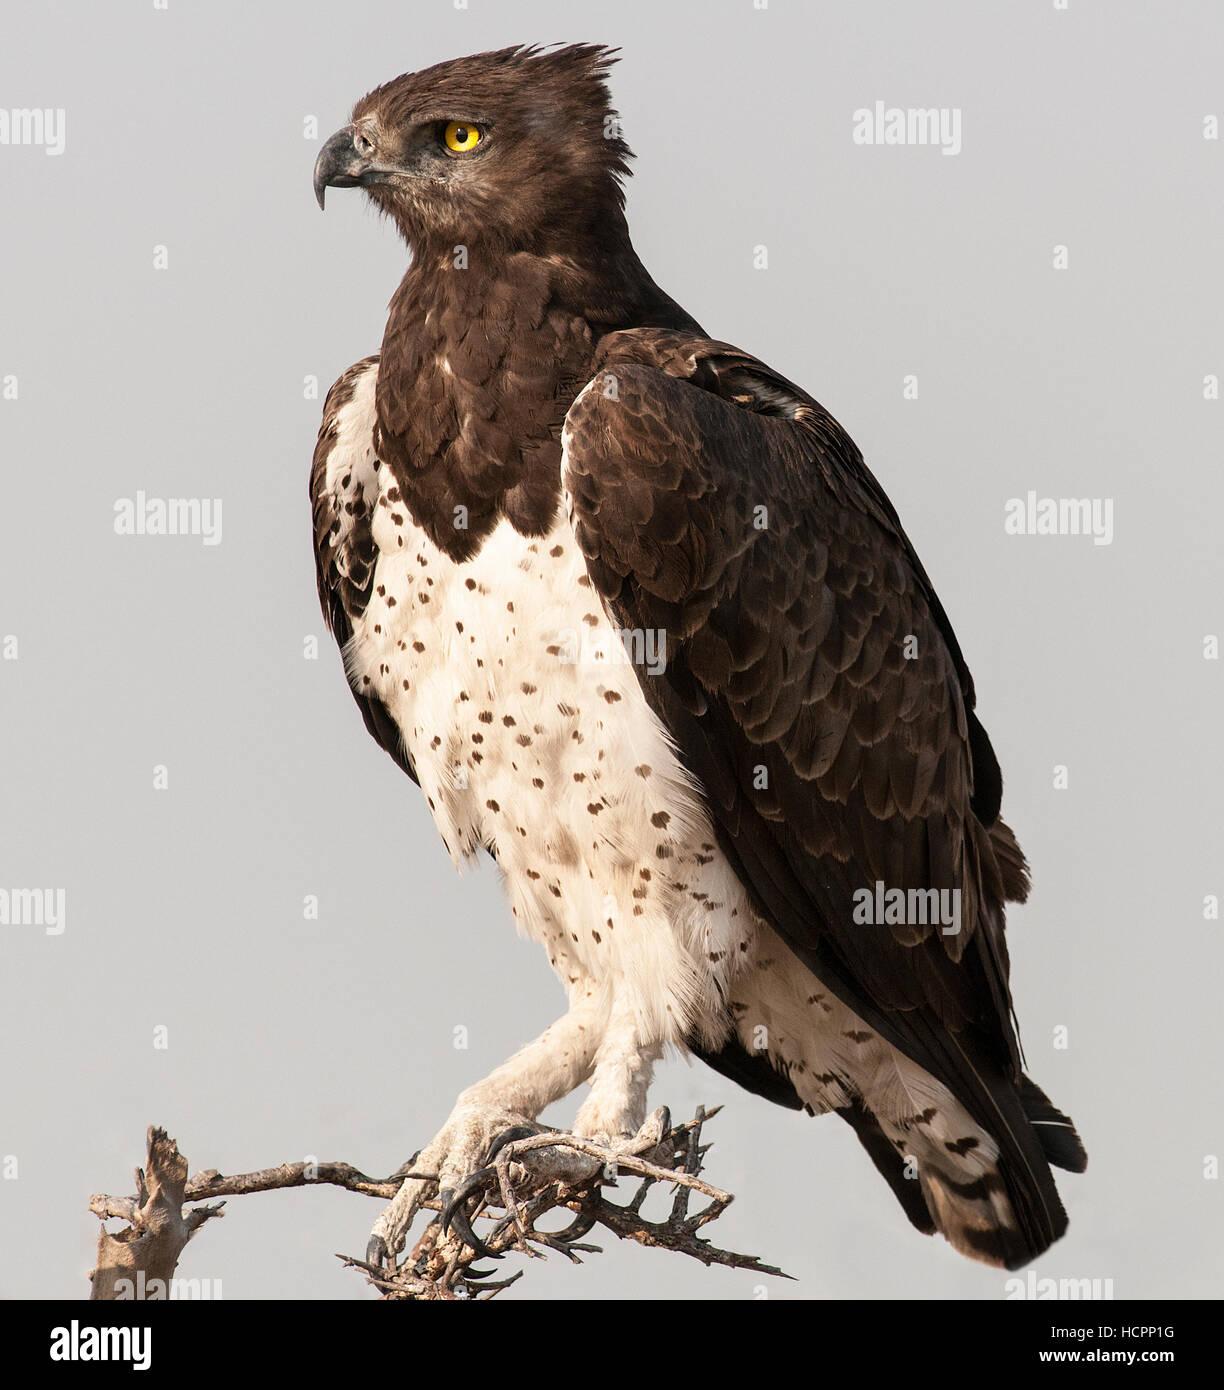 Martial's Eagle (Polemaetus bellicosus) perched   Nikon D300, Nikon 300 2.8 lens with 1.4 teleconverter, 1/1250, - Stock Image